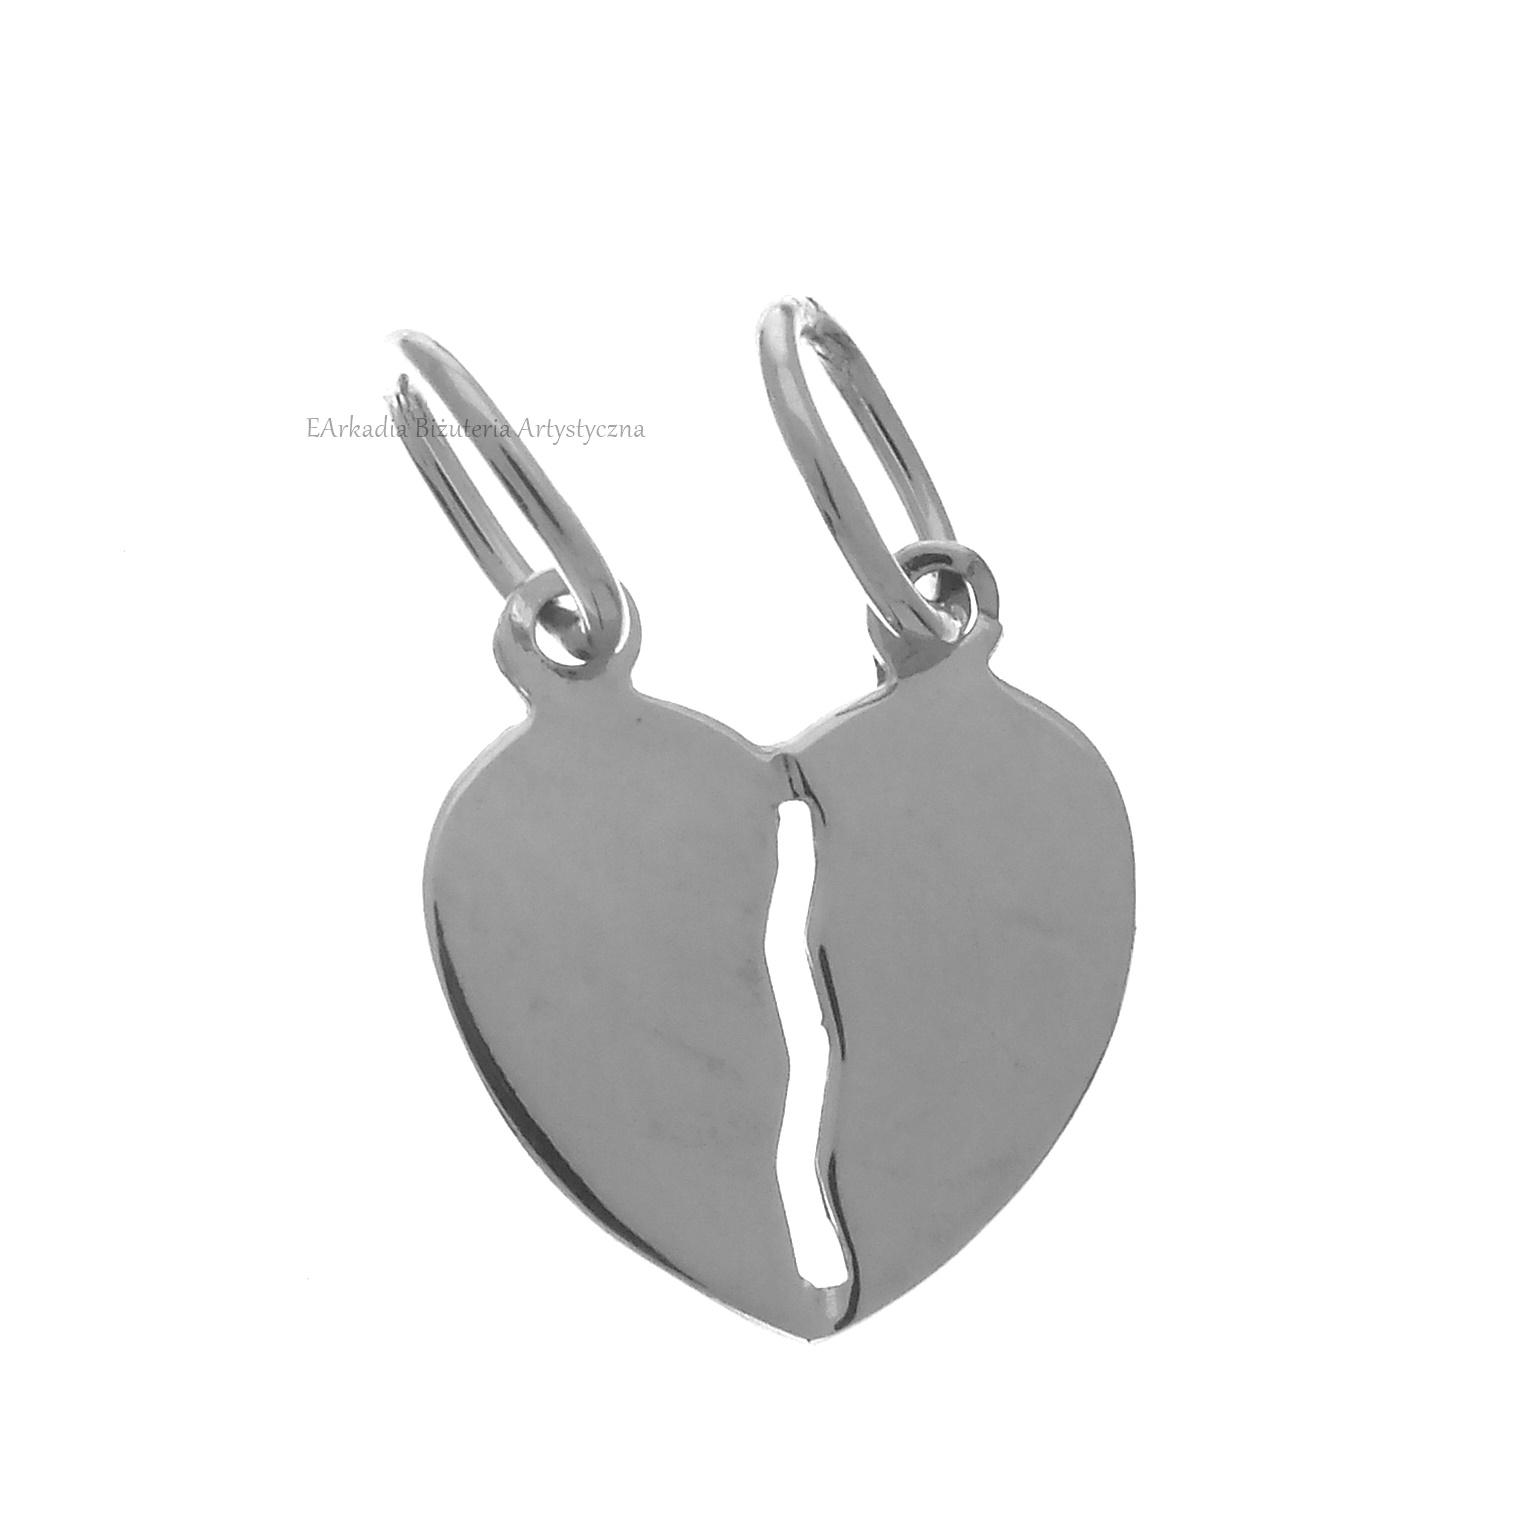 4bddded04372ed Wisiorek srebrny 925 serce łamane, podwójne, dla par